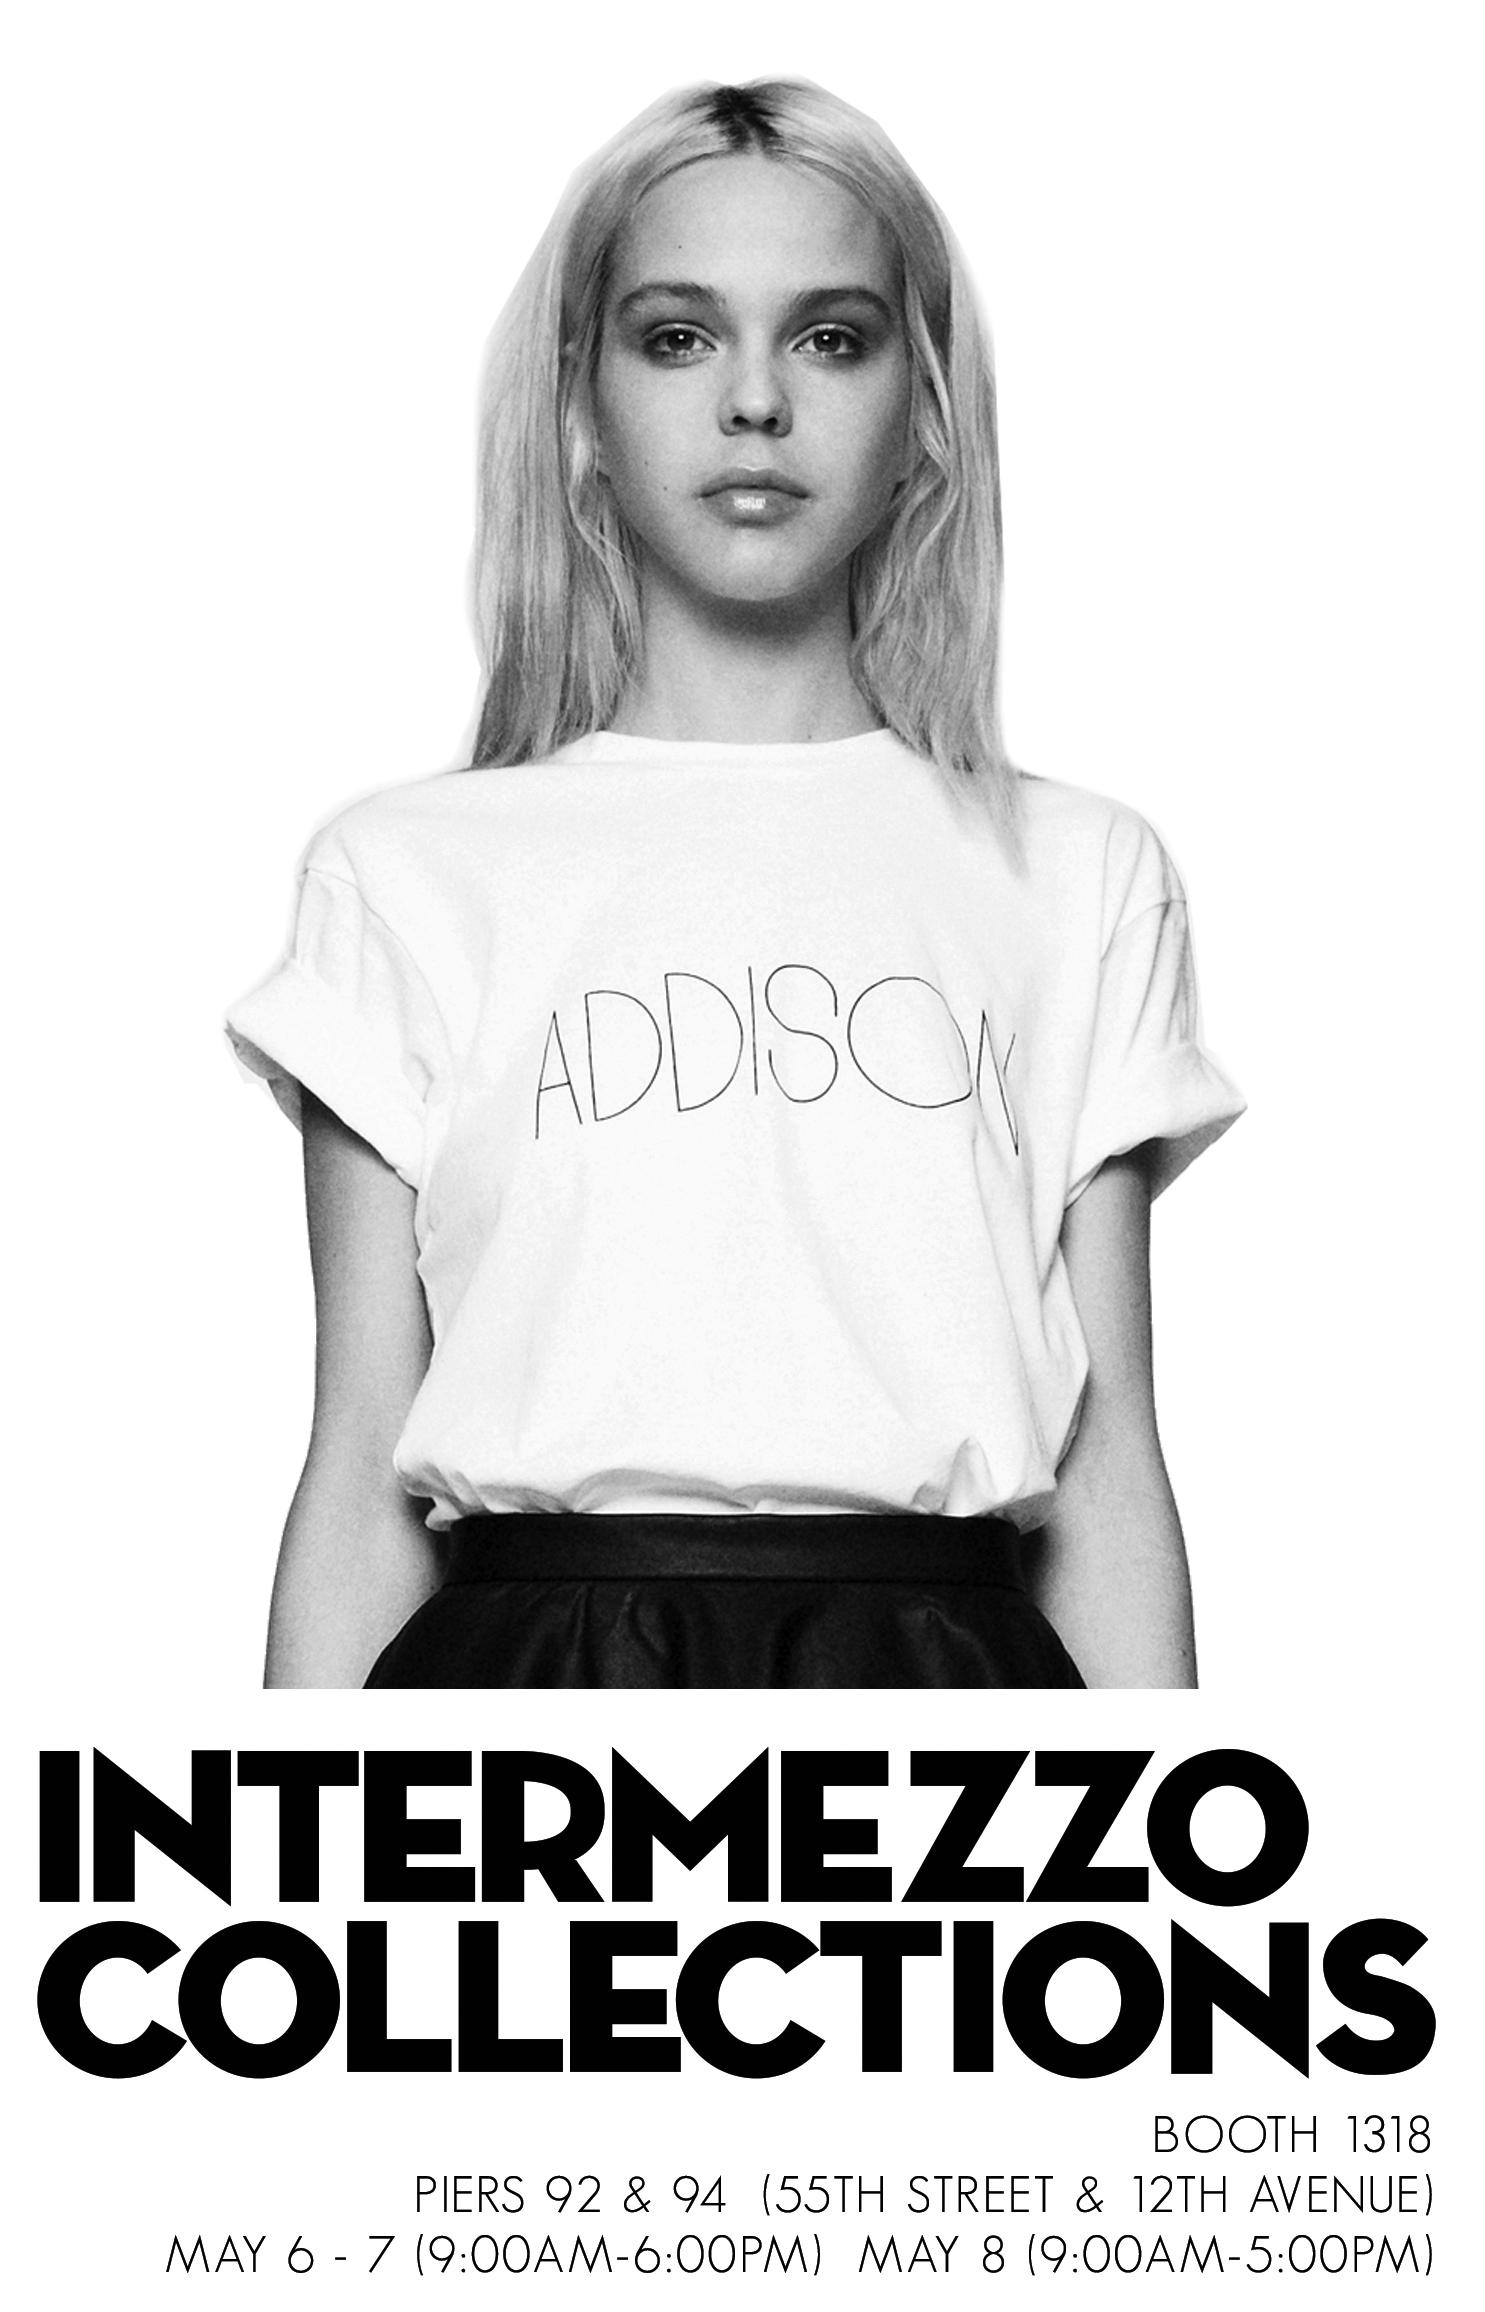 intermezzo holiday 2013 sqsp.jpg